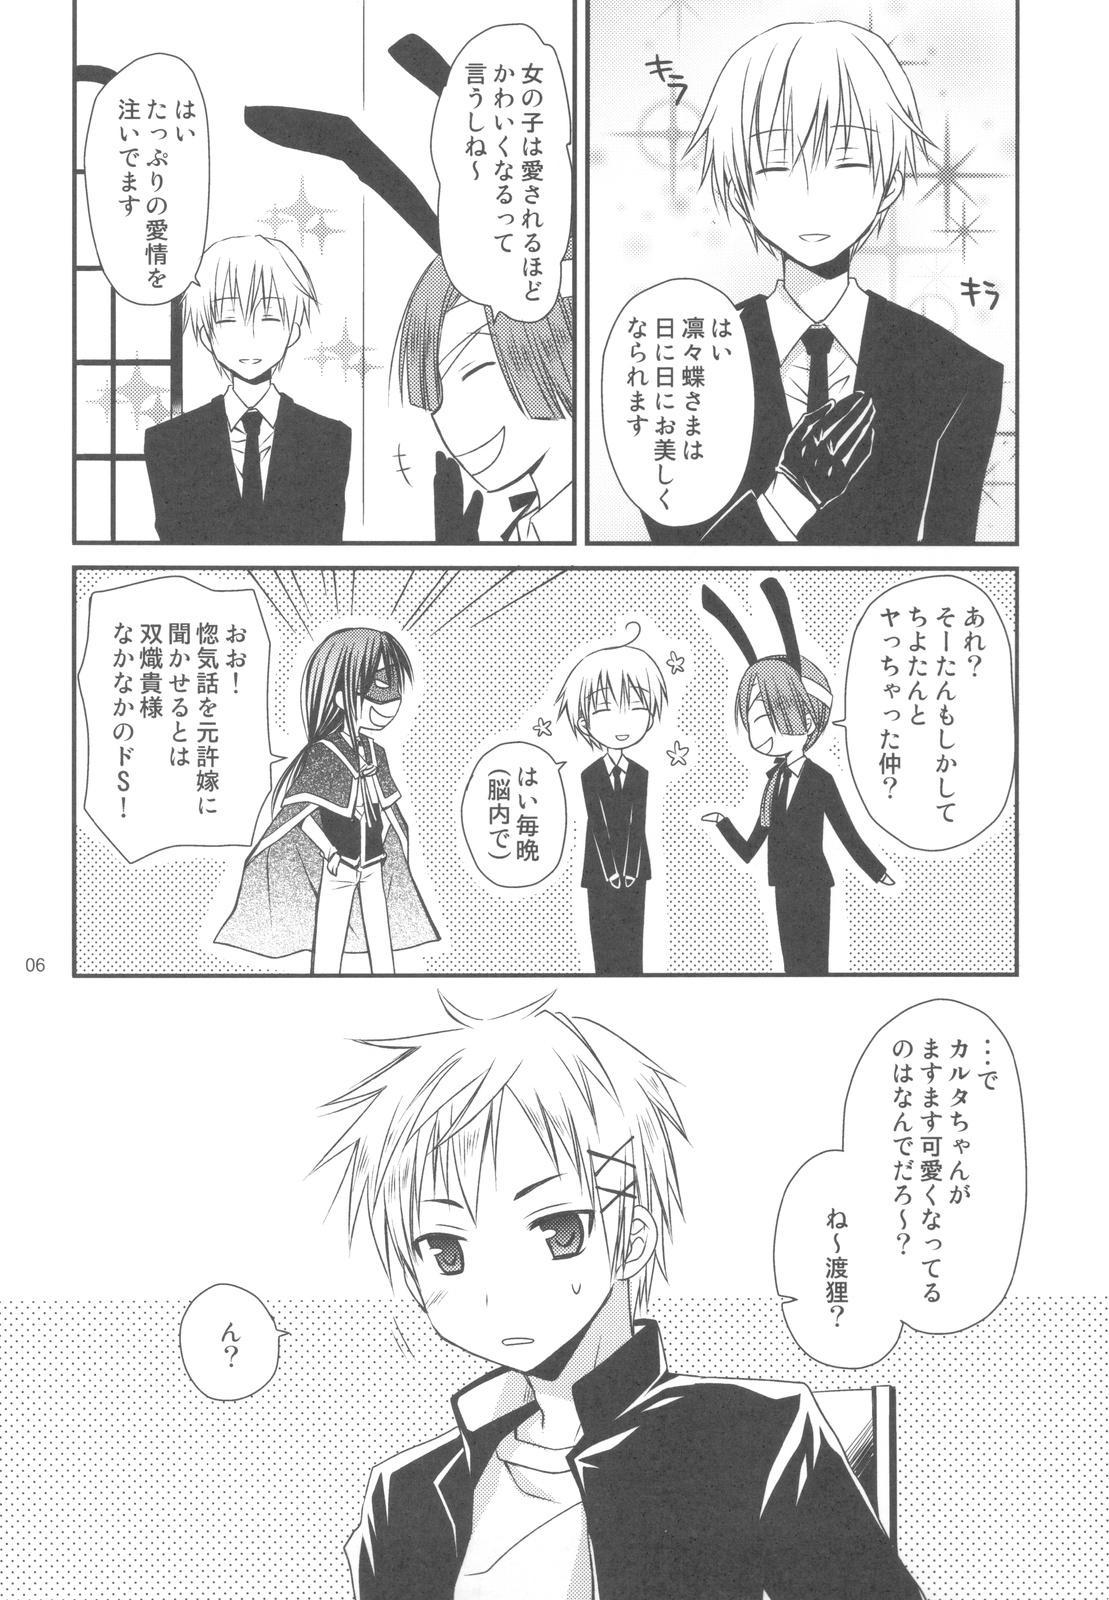 Chiisana Ai no Monogatari 4